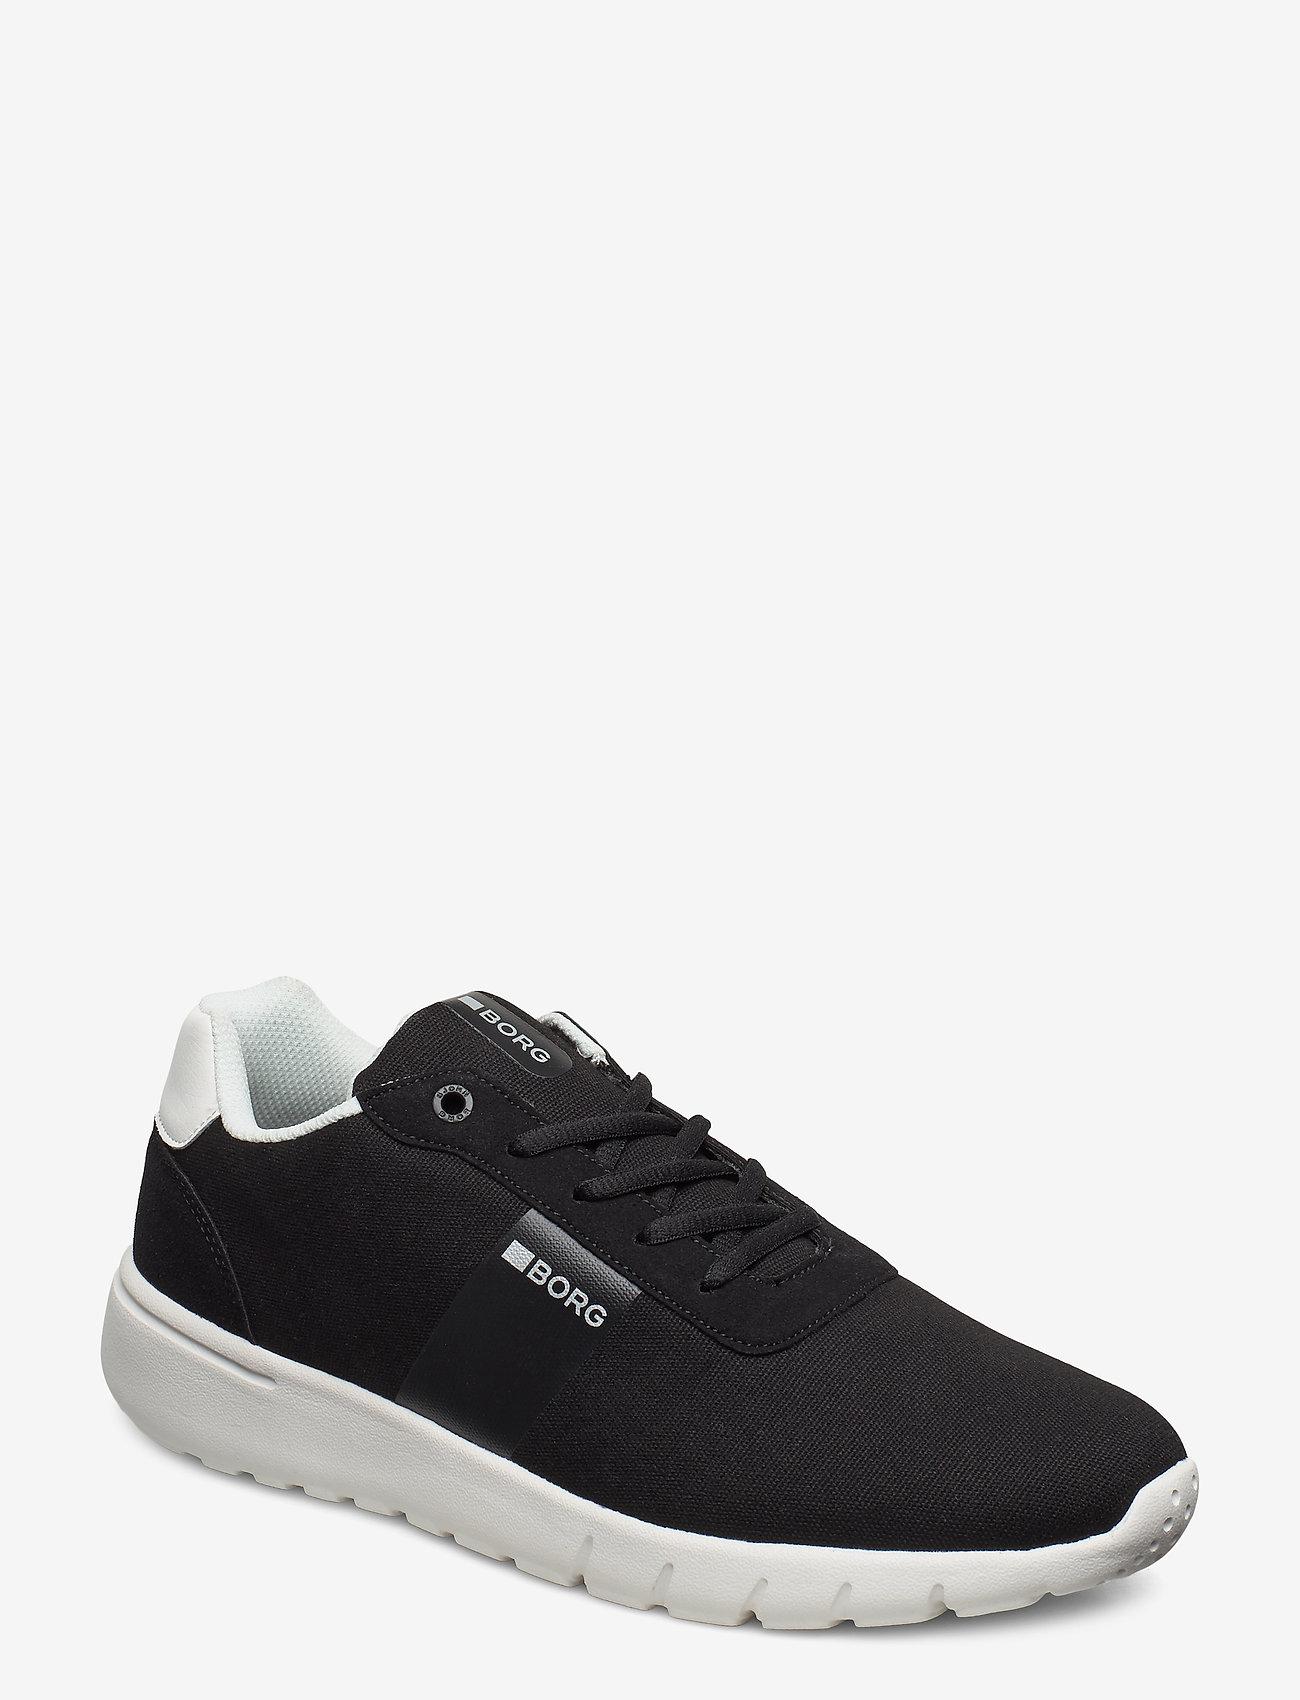 Björn Borg - R1060 CVS M - laag sneakers - black - 0